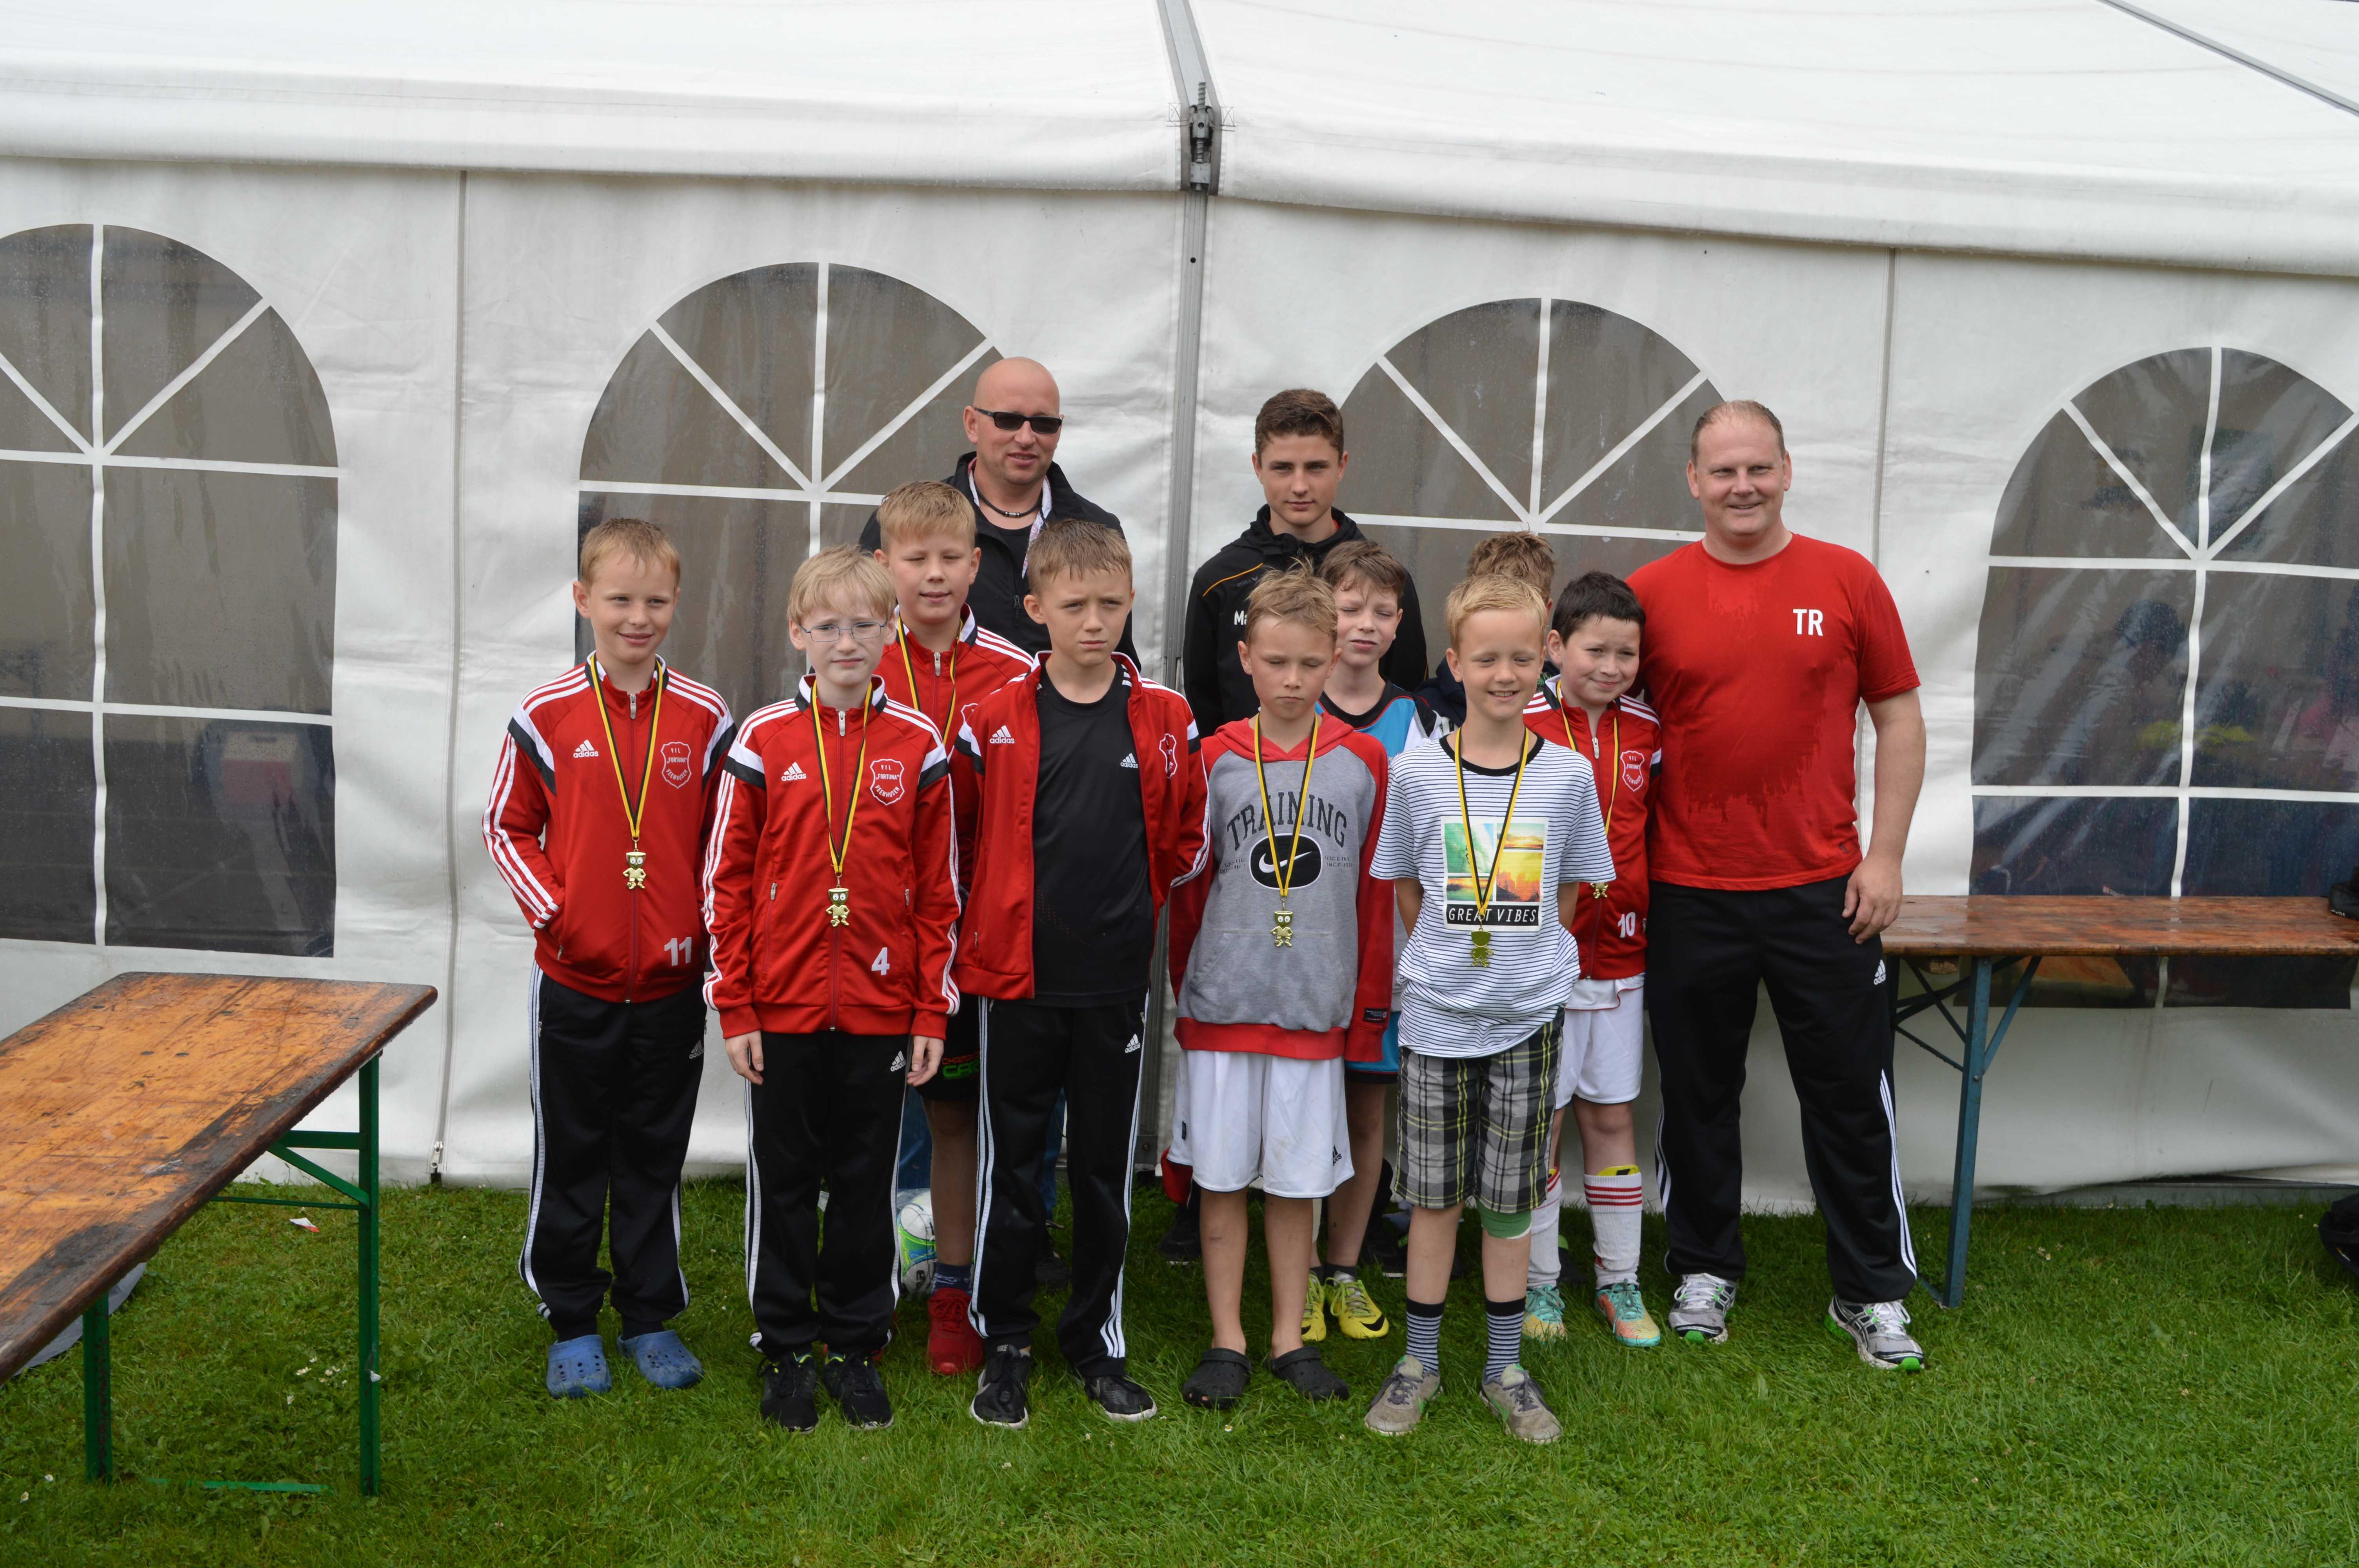 2016-07-31 Sportwoche - erster Sonntag (4)